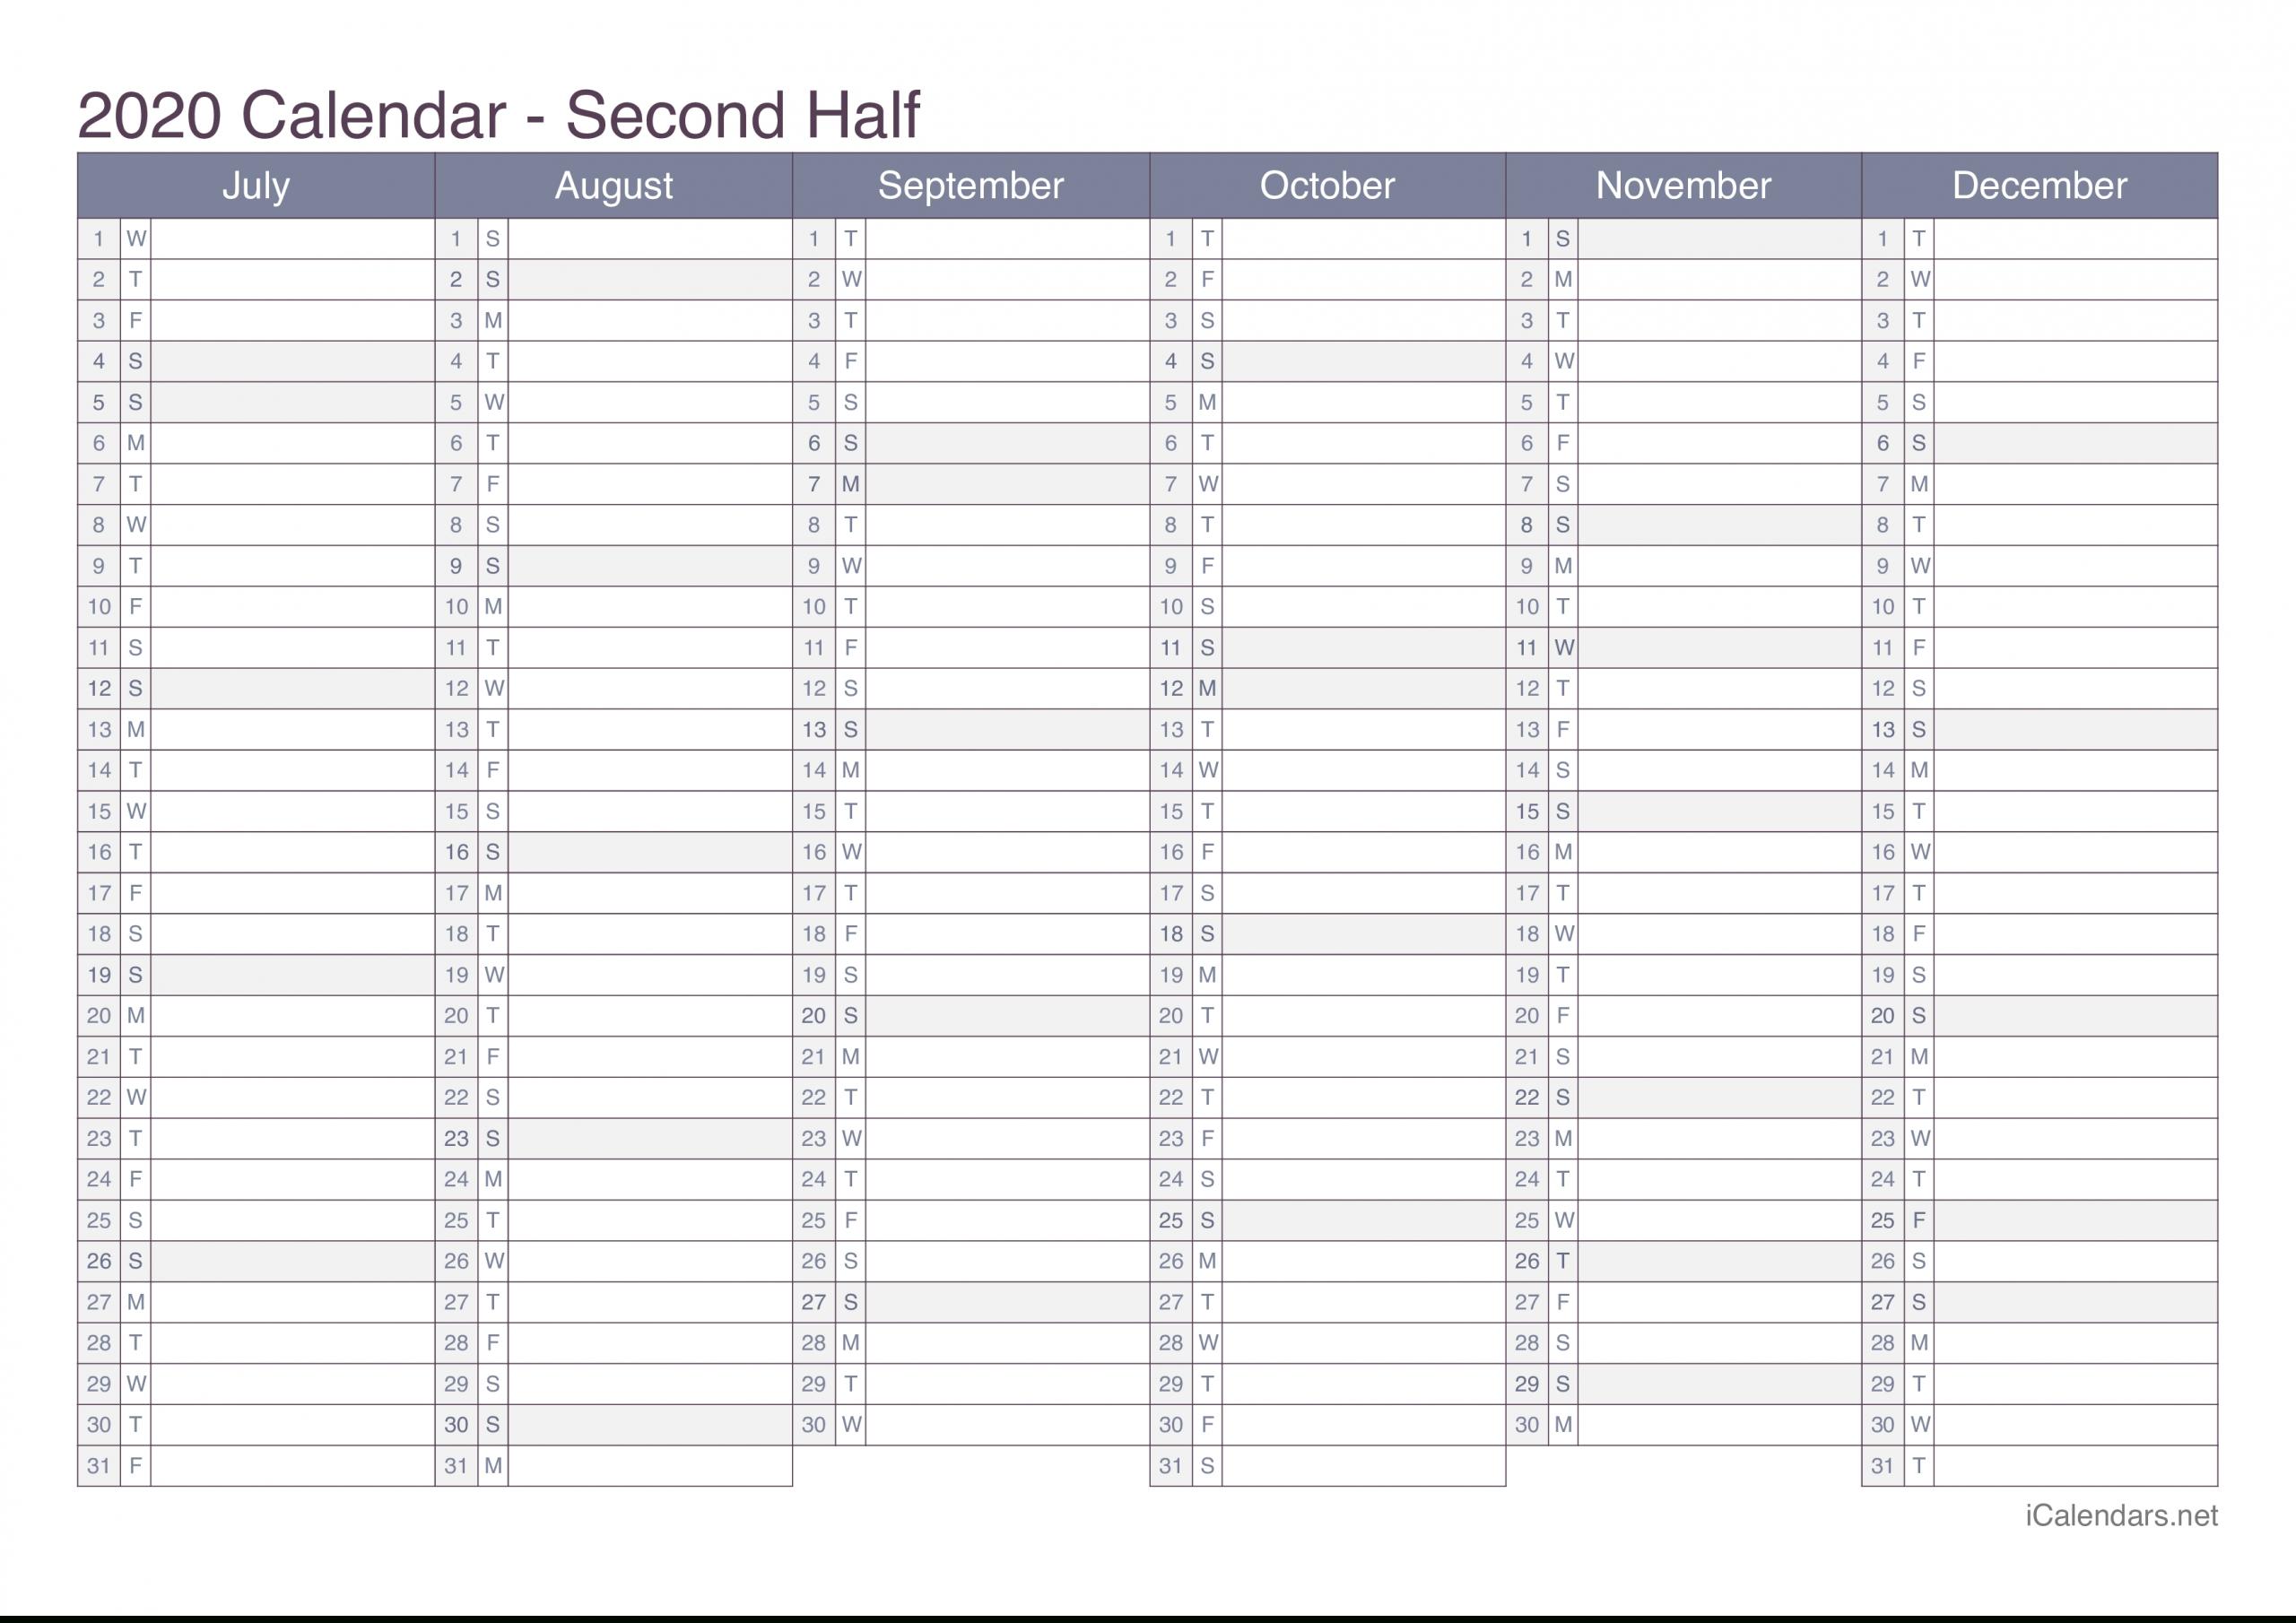 2020 Printable Calendar - Pdf Or Excel - Icalendars  Printable Calendars With Lines